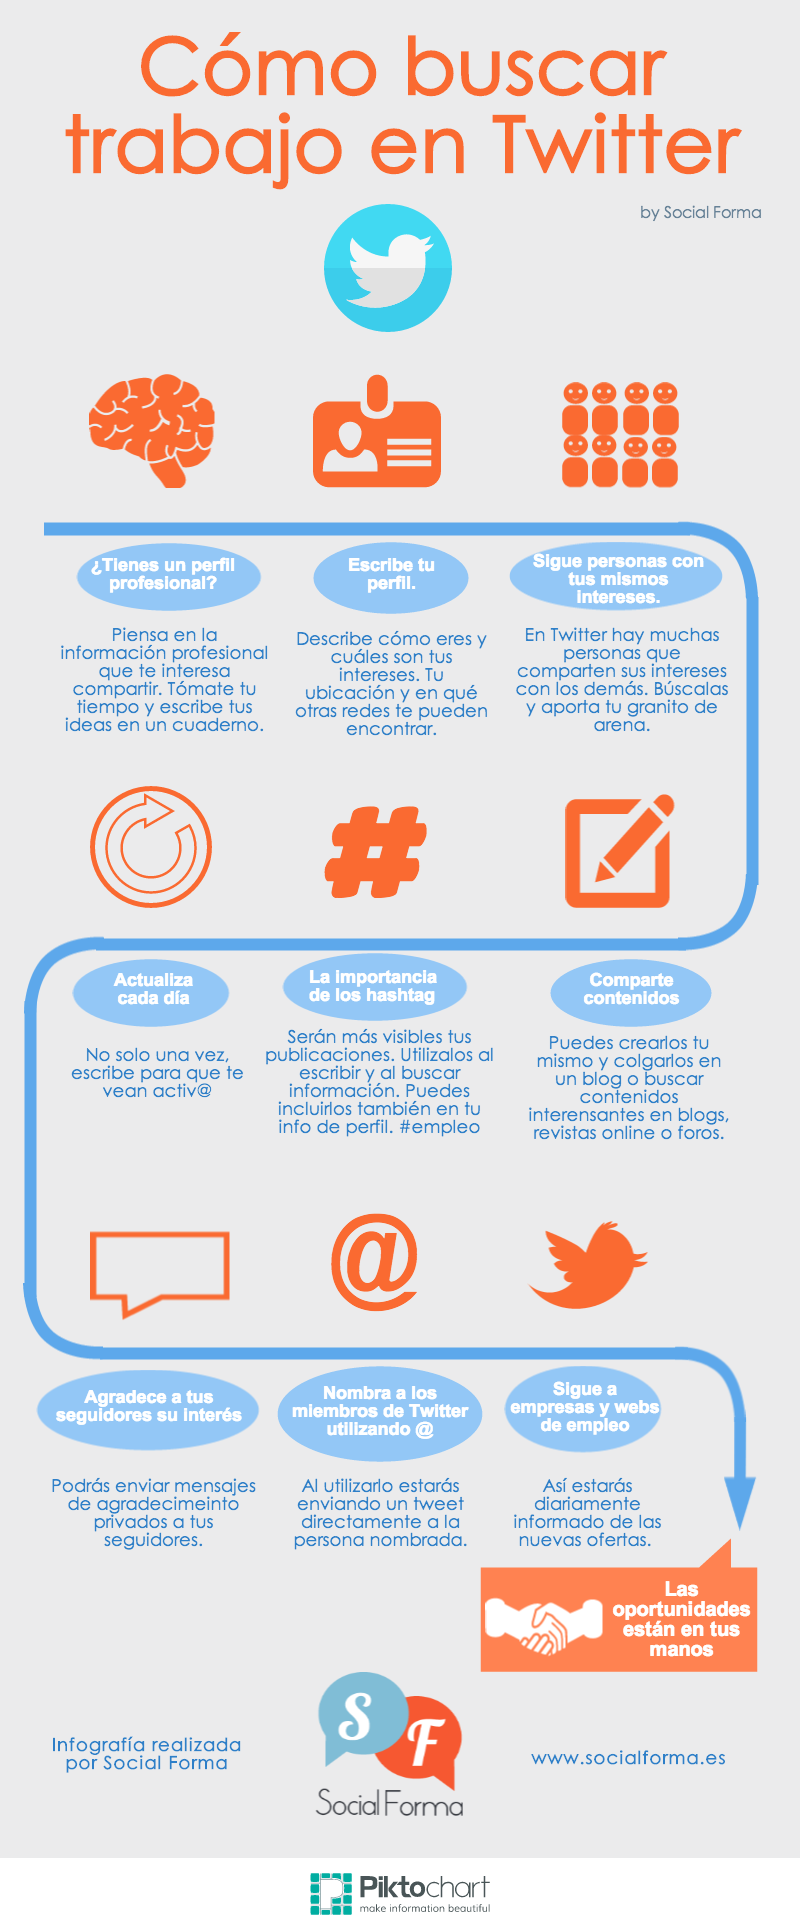 Cómo Buscar Trabajo Con Twitter Infografia Infographic Empleo Socialmedia